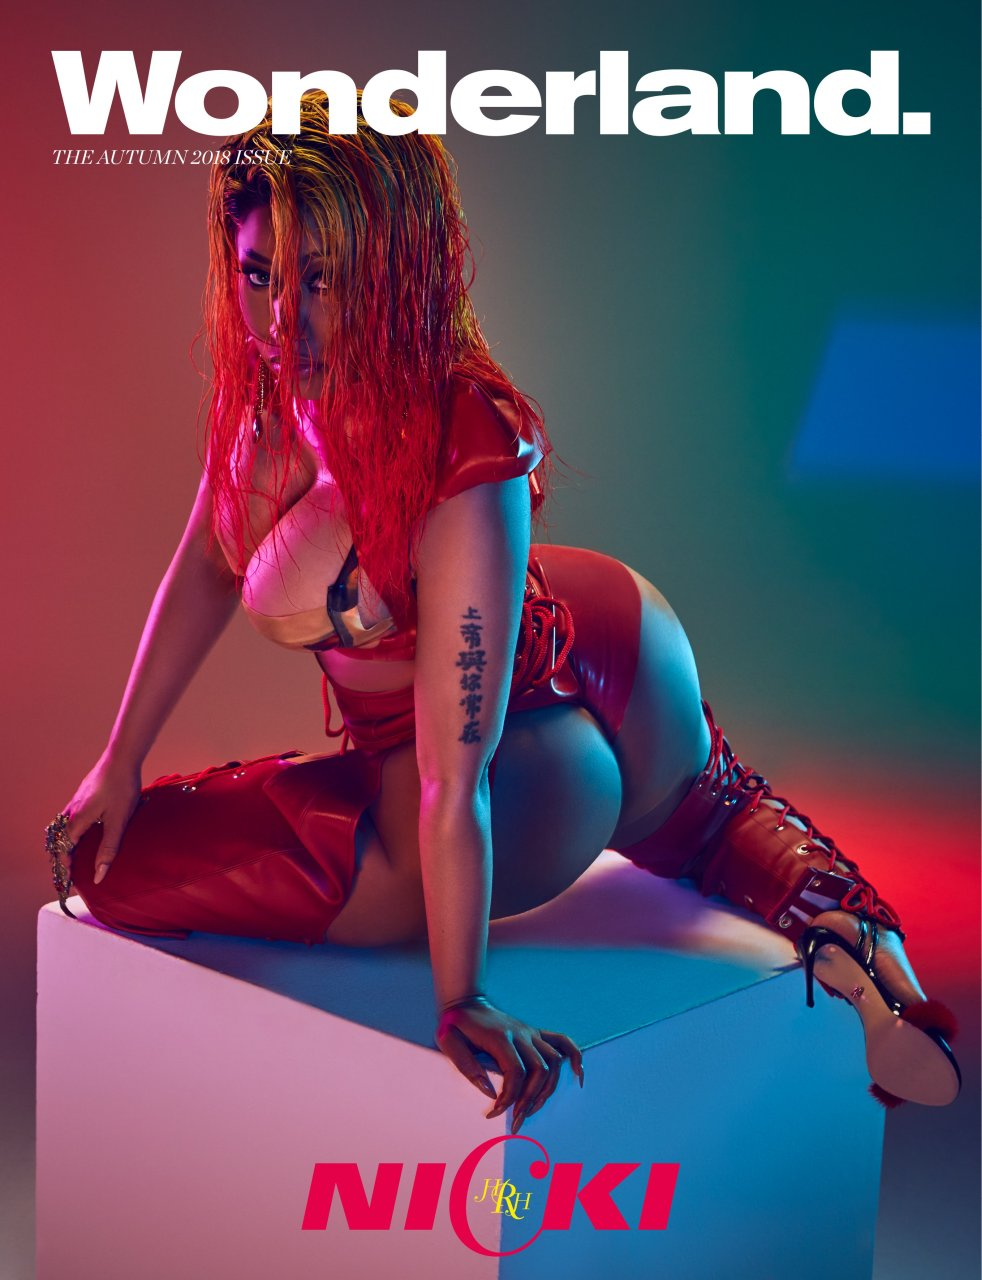 Nicki-Minaj-Sexy-TheFappeningBlog.com-1-1.jpg